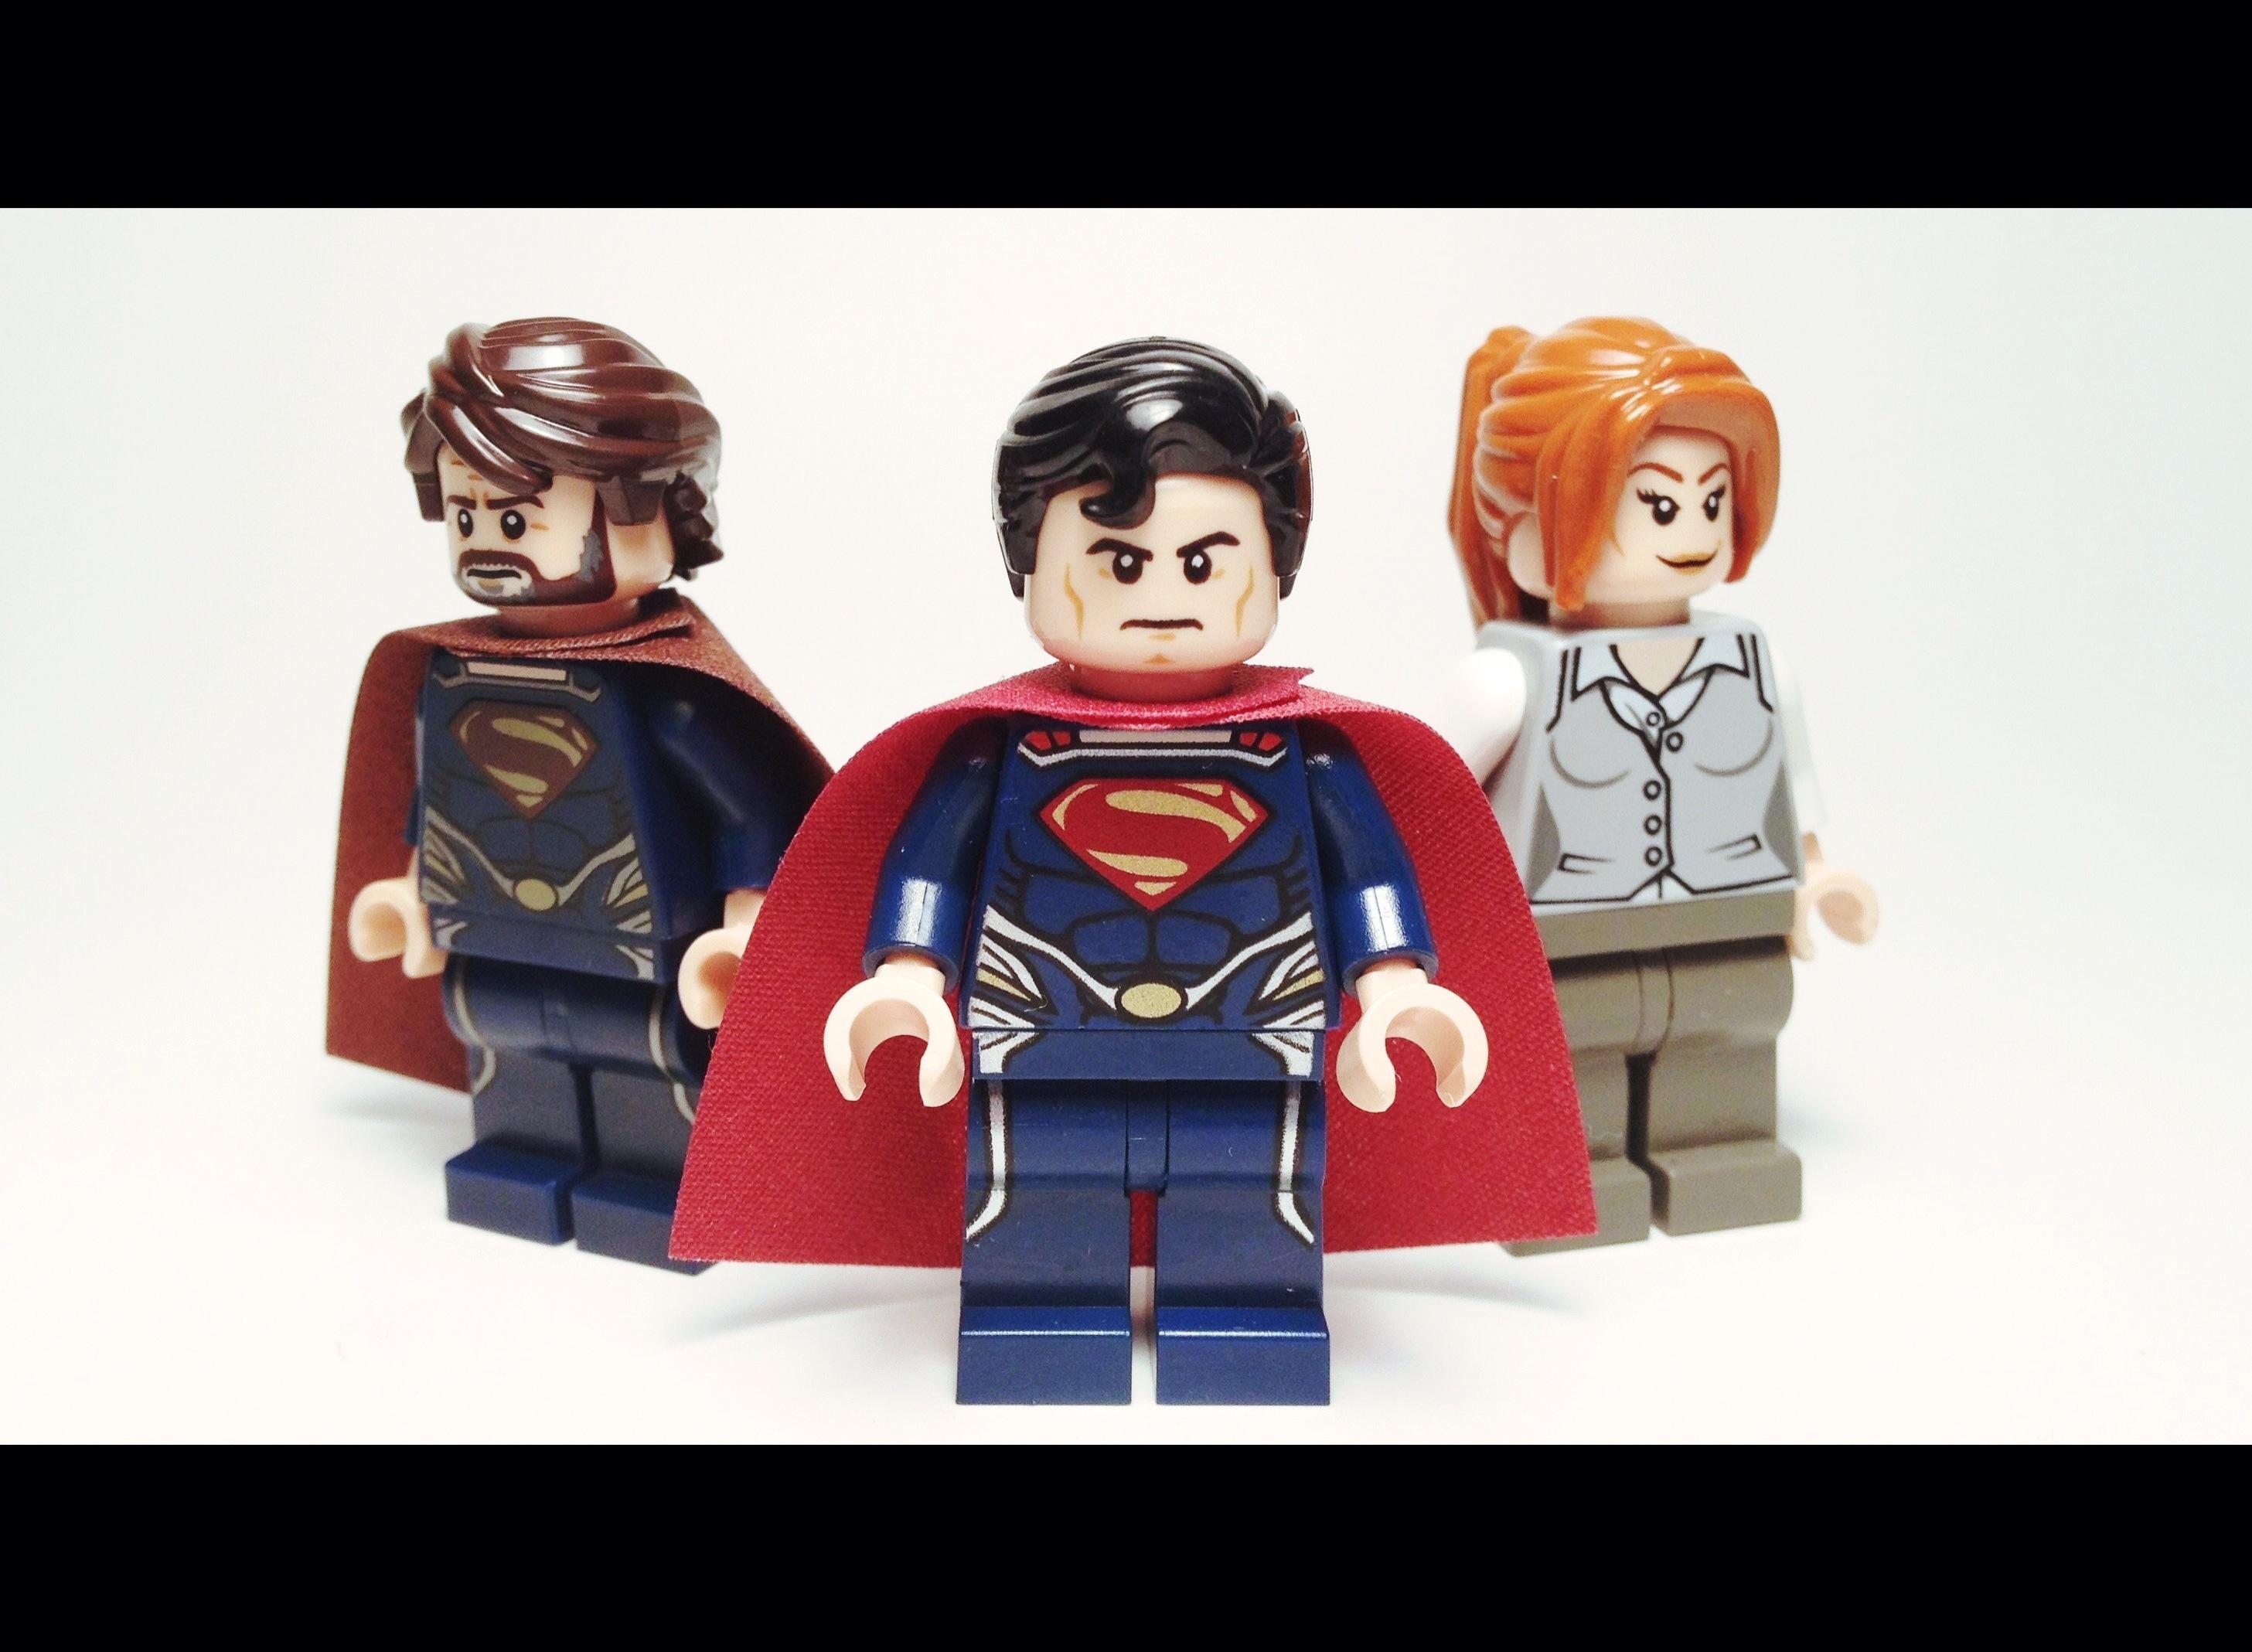 Wallpaper Man Lego Steel Superman Minifigs Custom Loislane